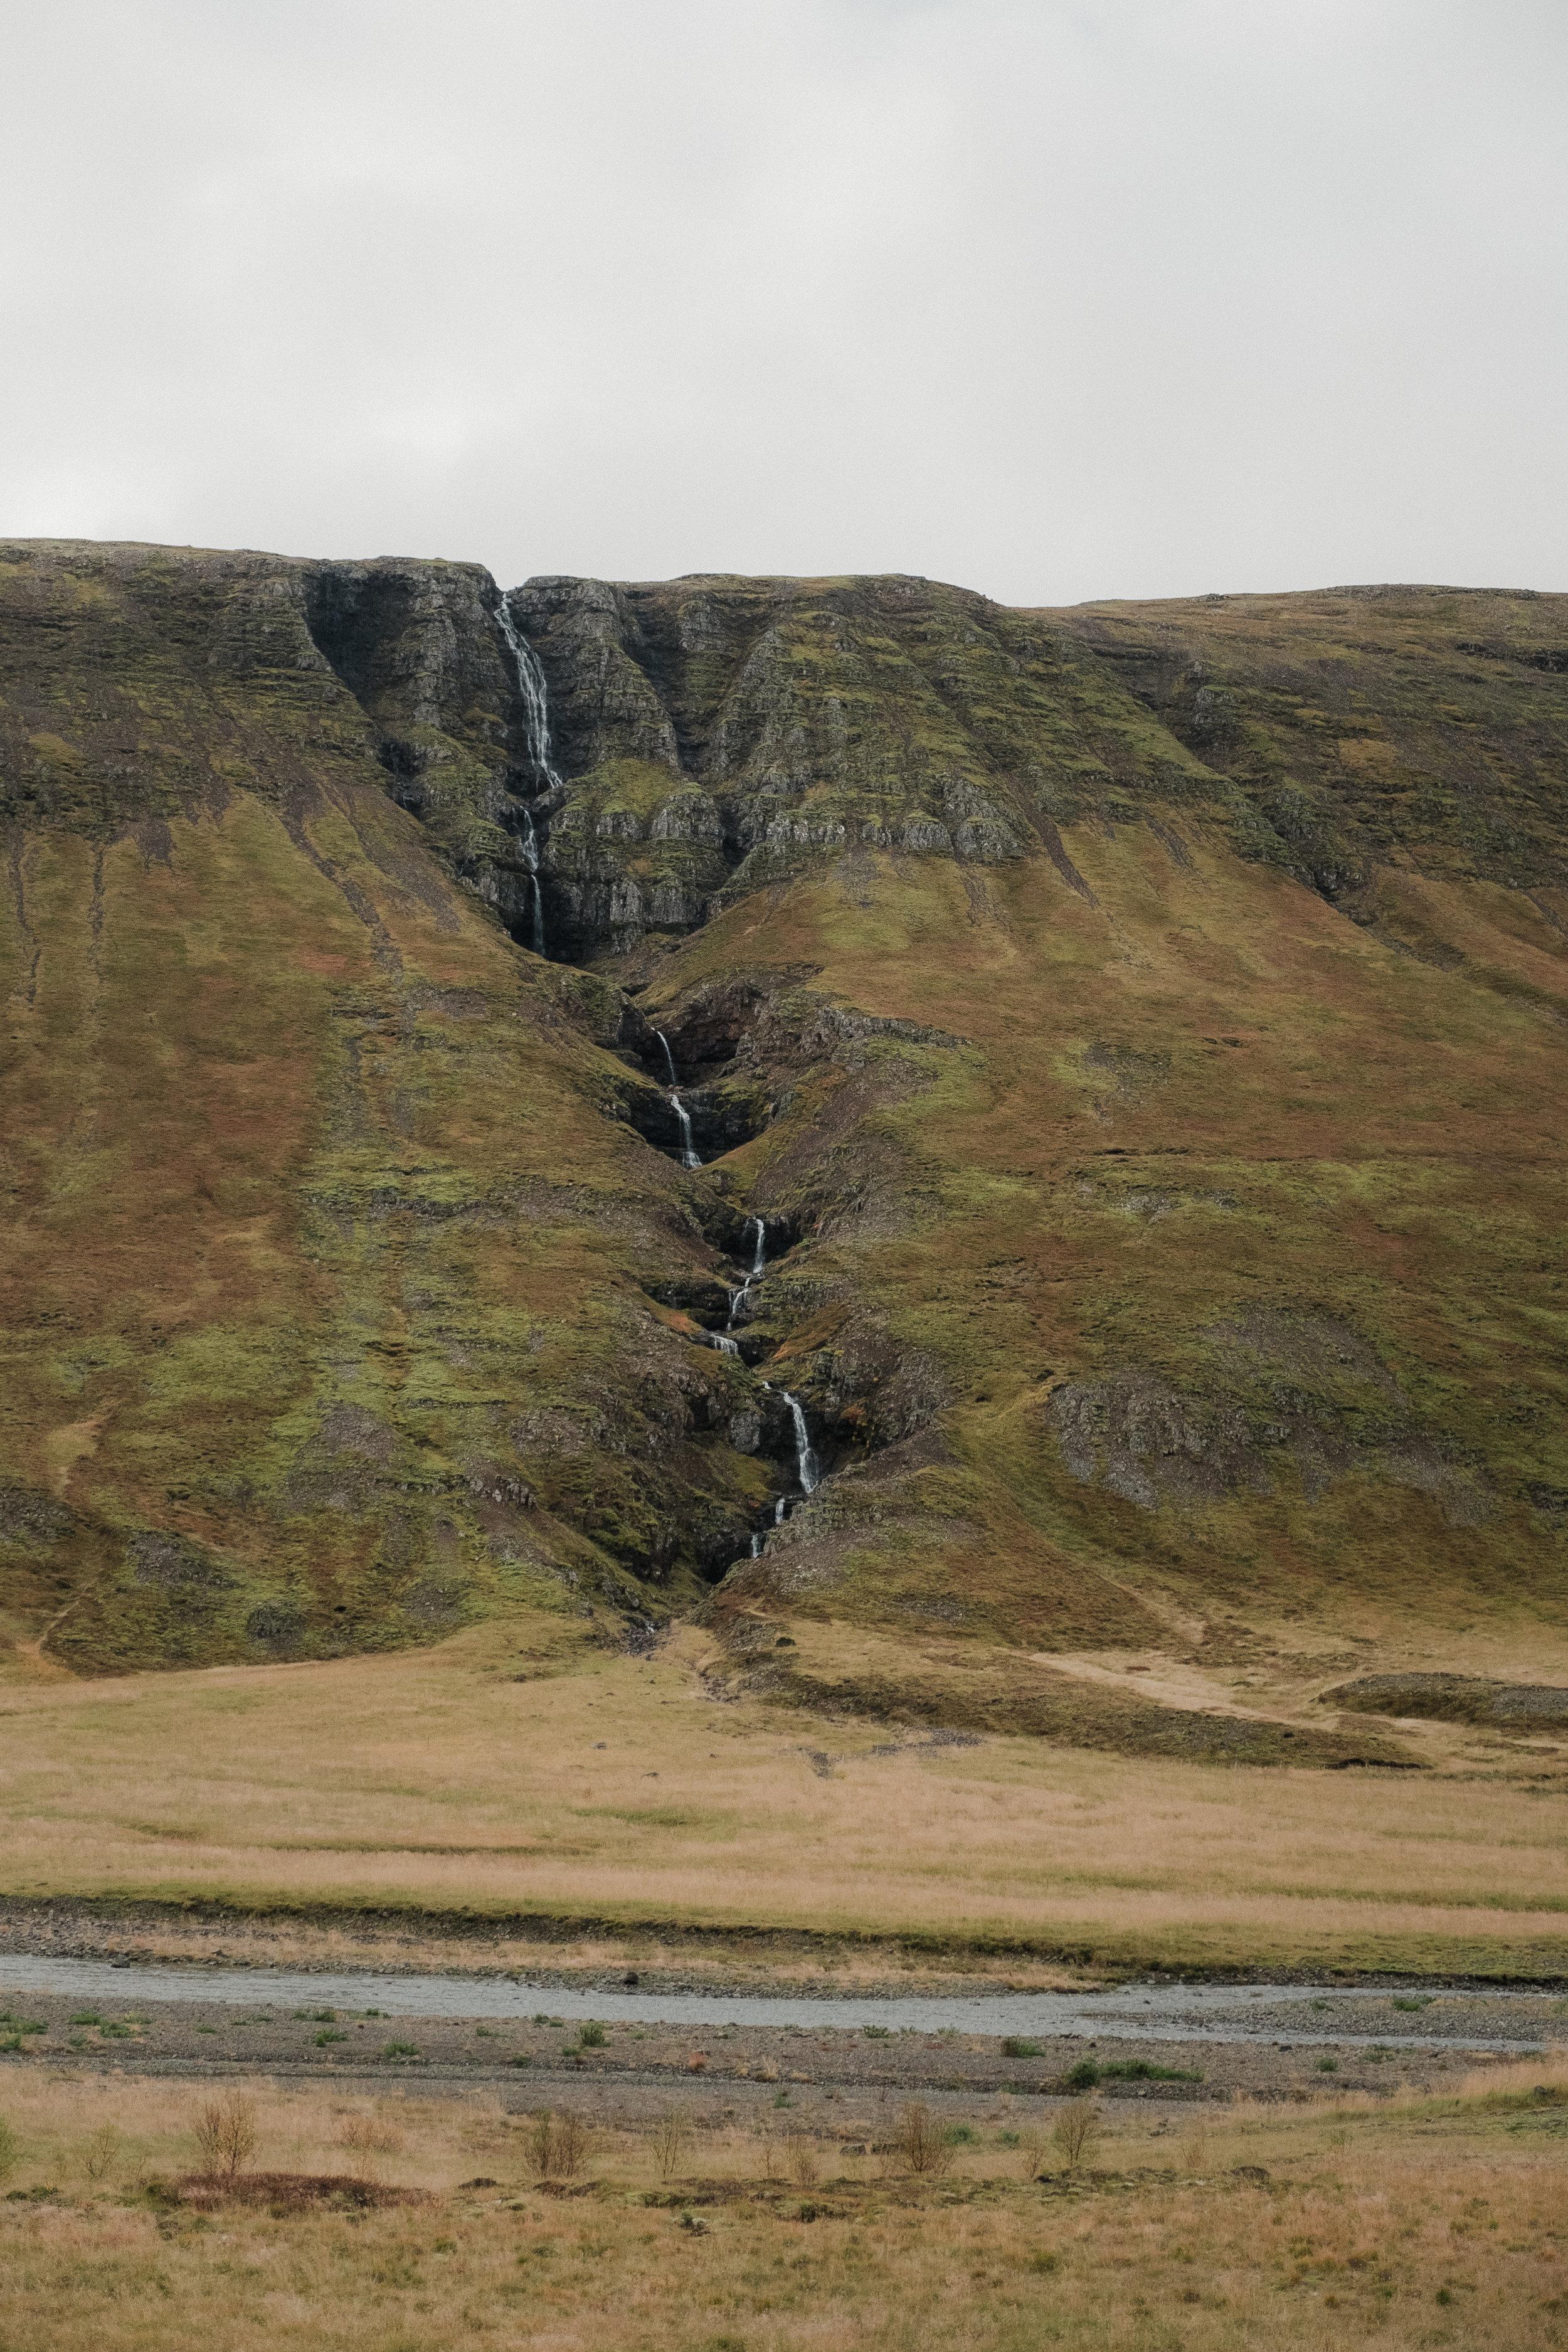 Northern-Iceland-1.jpg